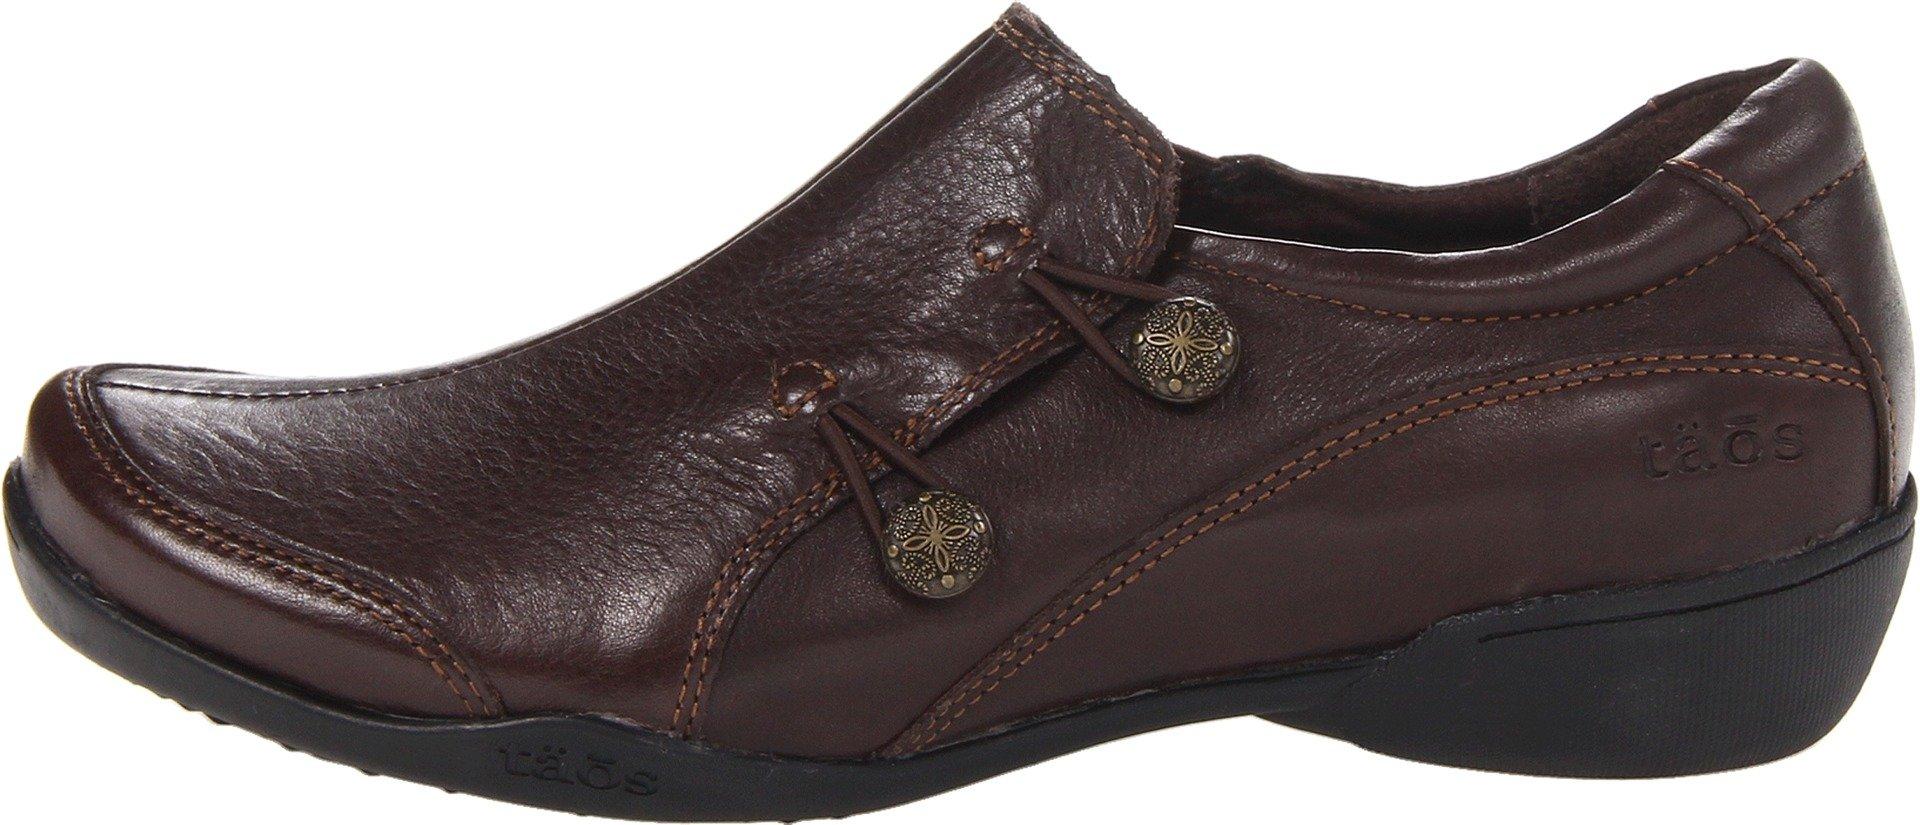 Taos Women's Encore Flat,Chocolate,7 M US by Taos Footwear (Image #5)